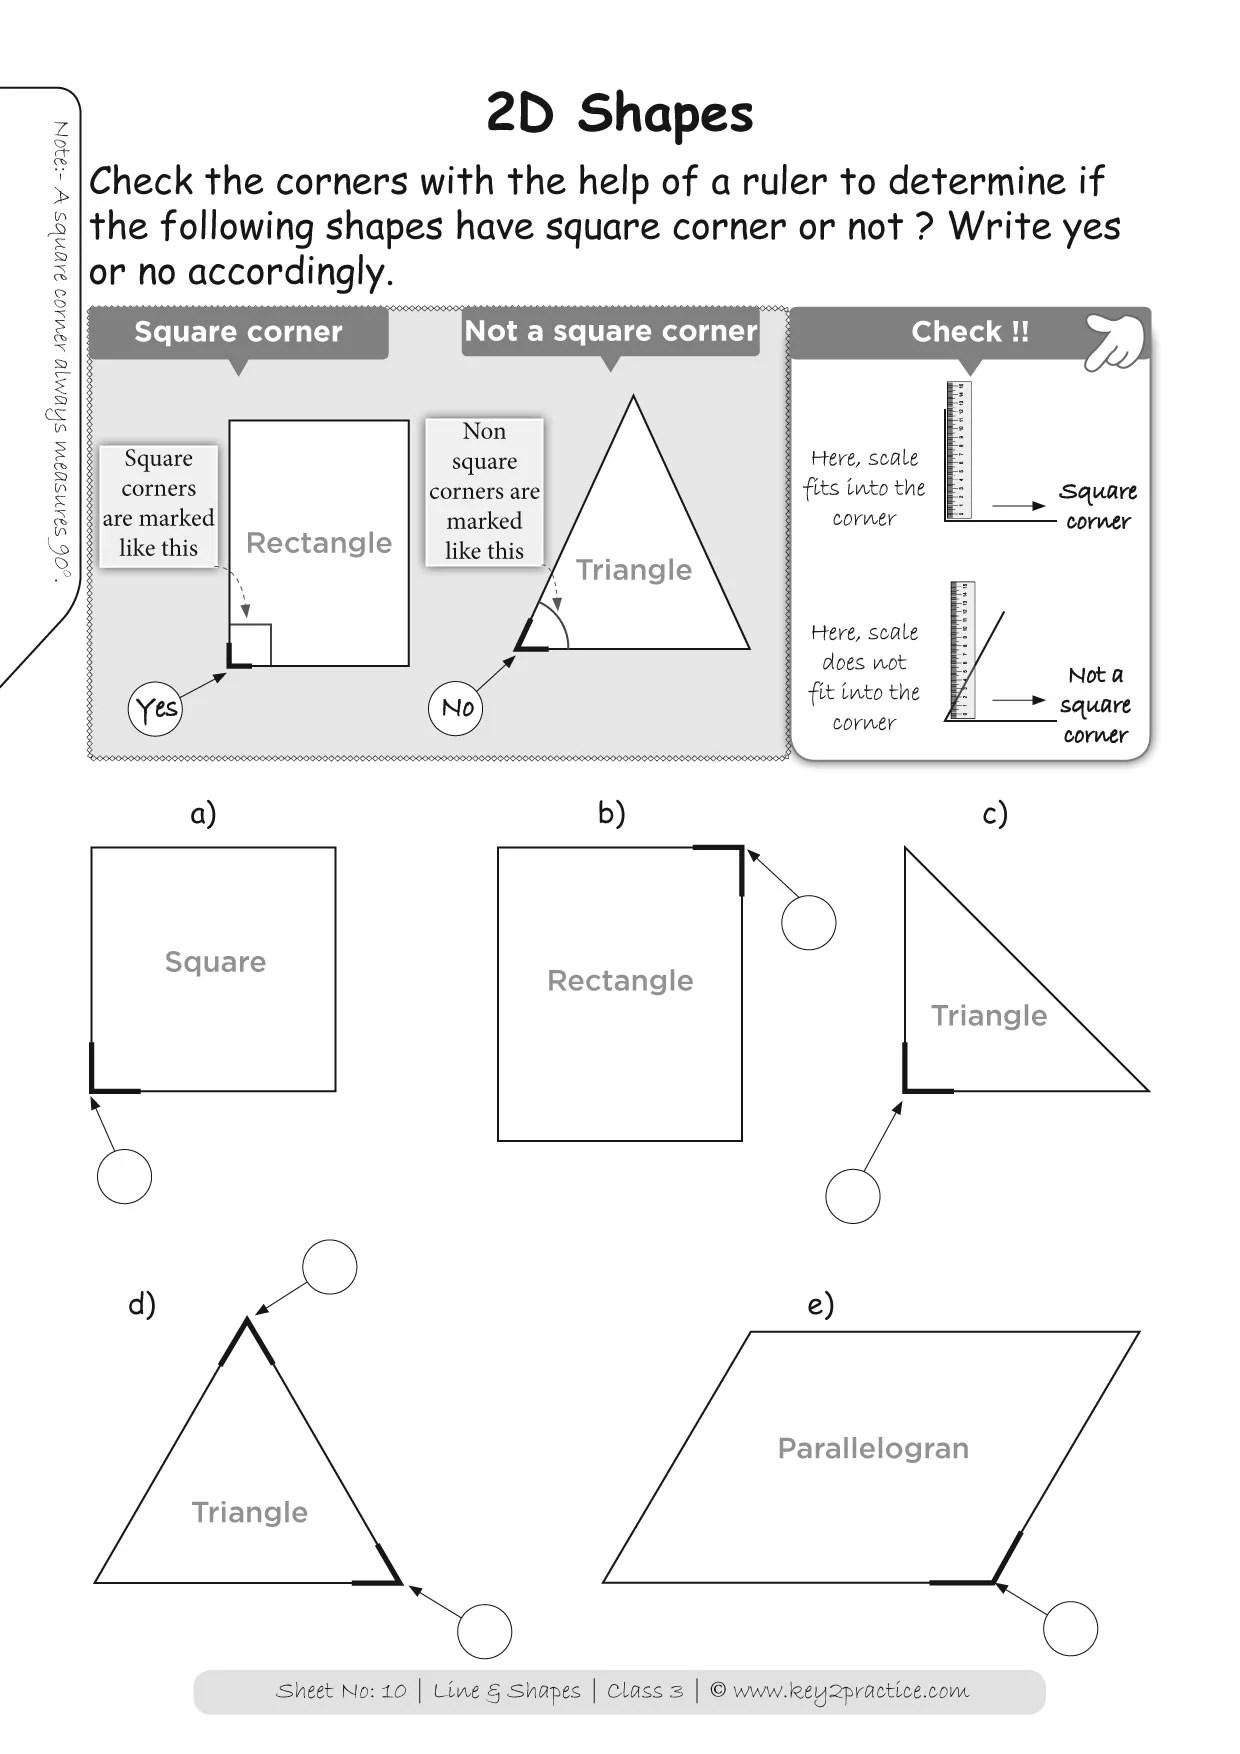 Shapes Worksheets Grade 3 I Maths - key2practice Workbooks [ 1754 x 1240 Pixel ]